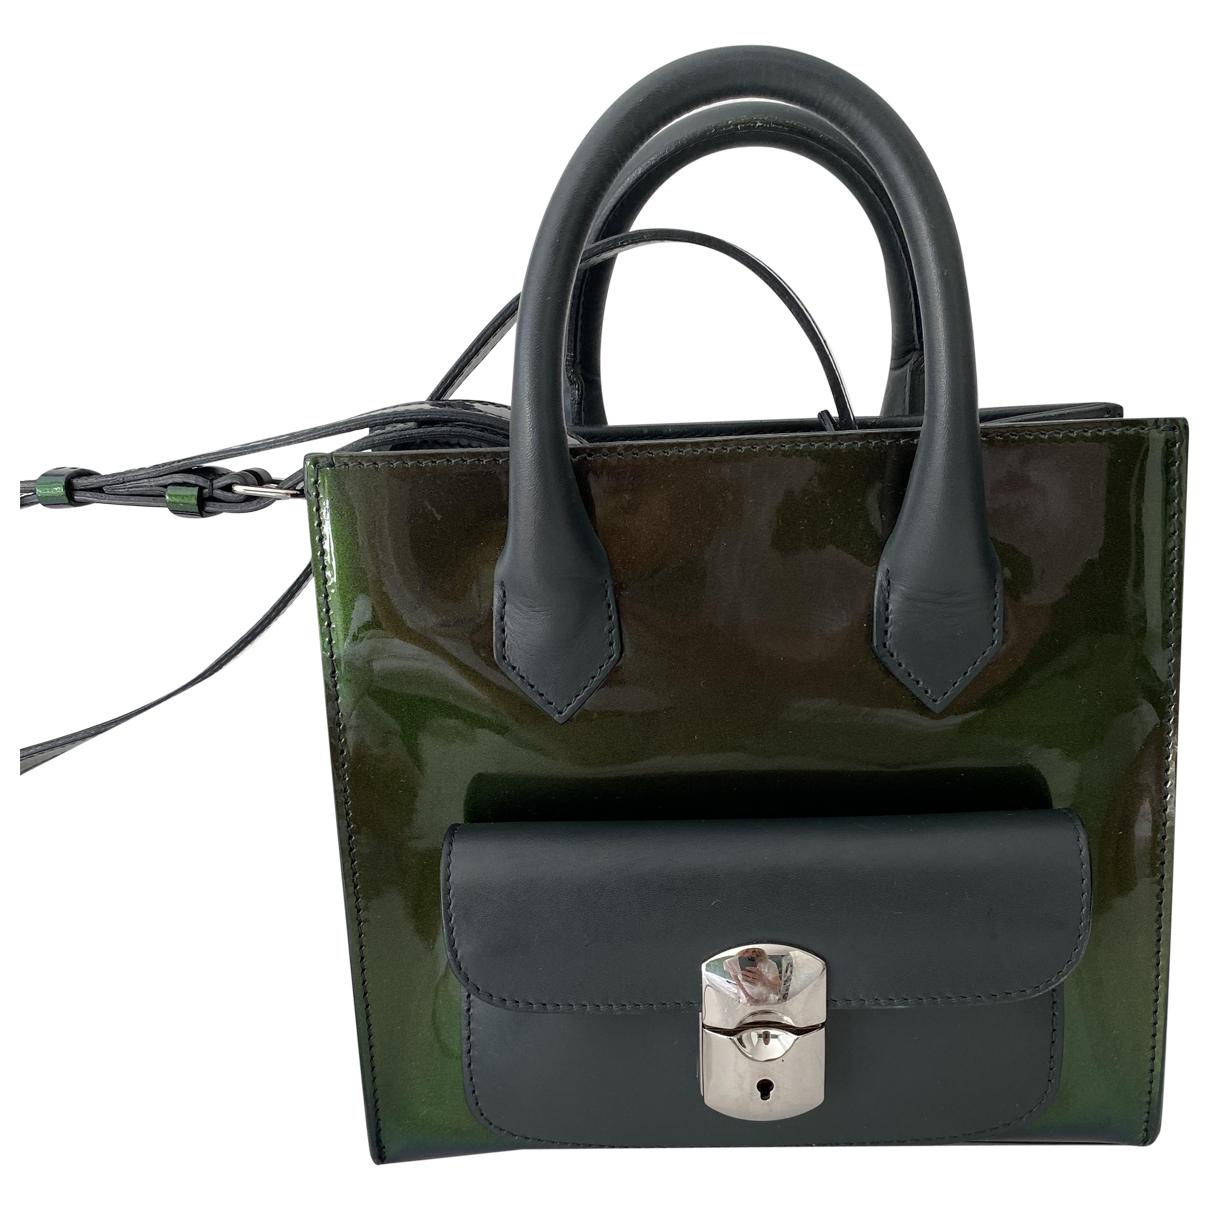 Balenciaga Padlock Handtasche in  Gruen Lackleder